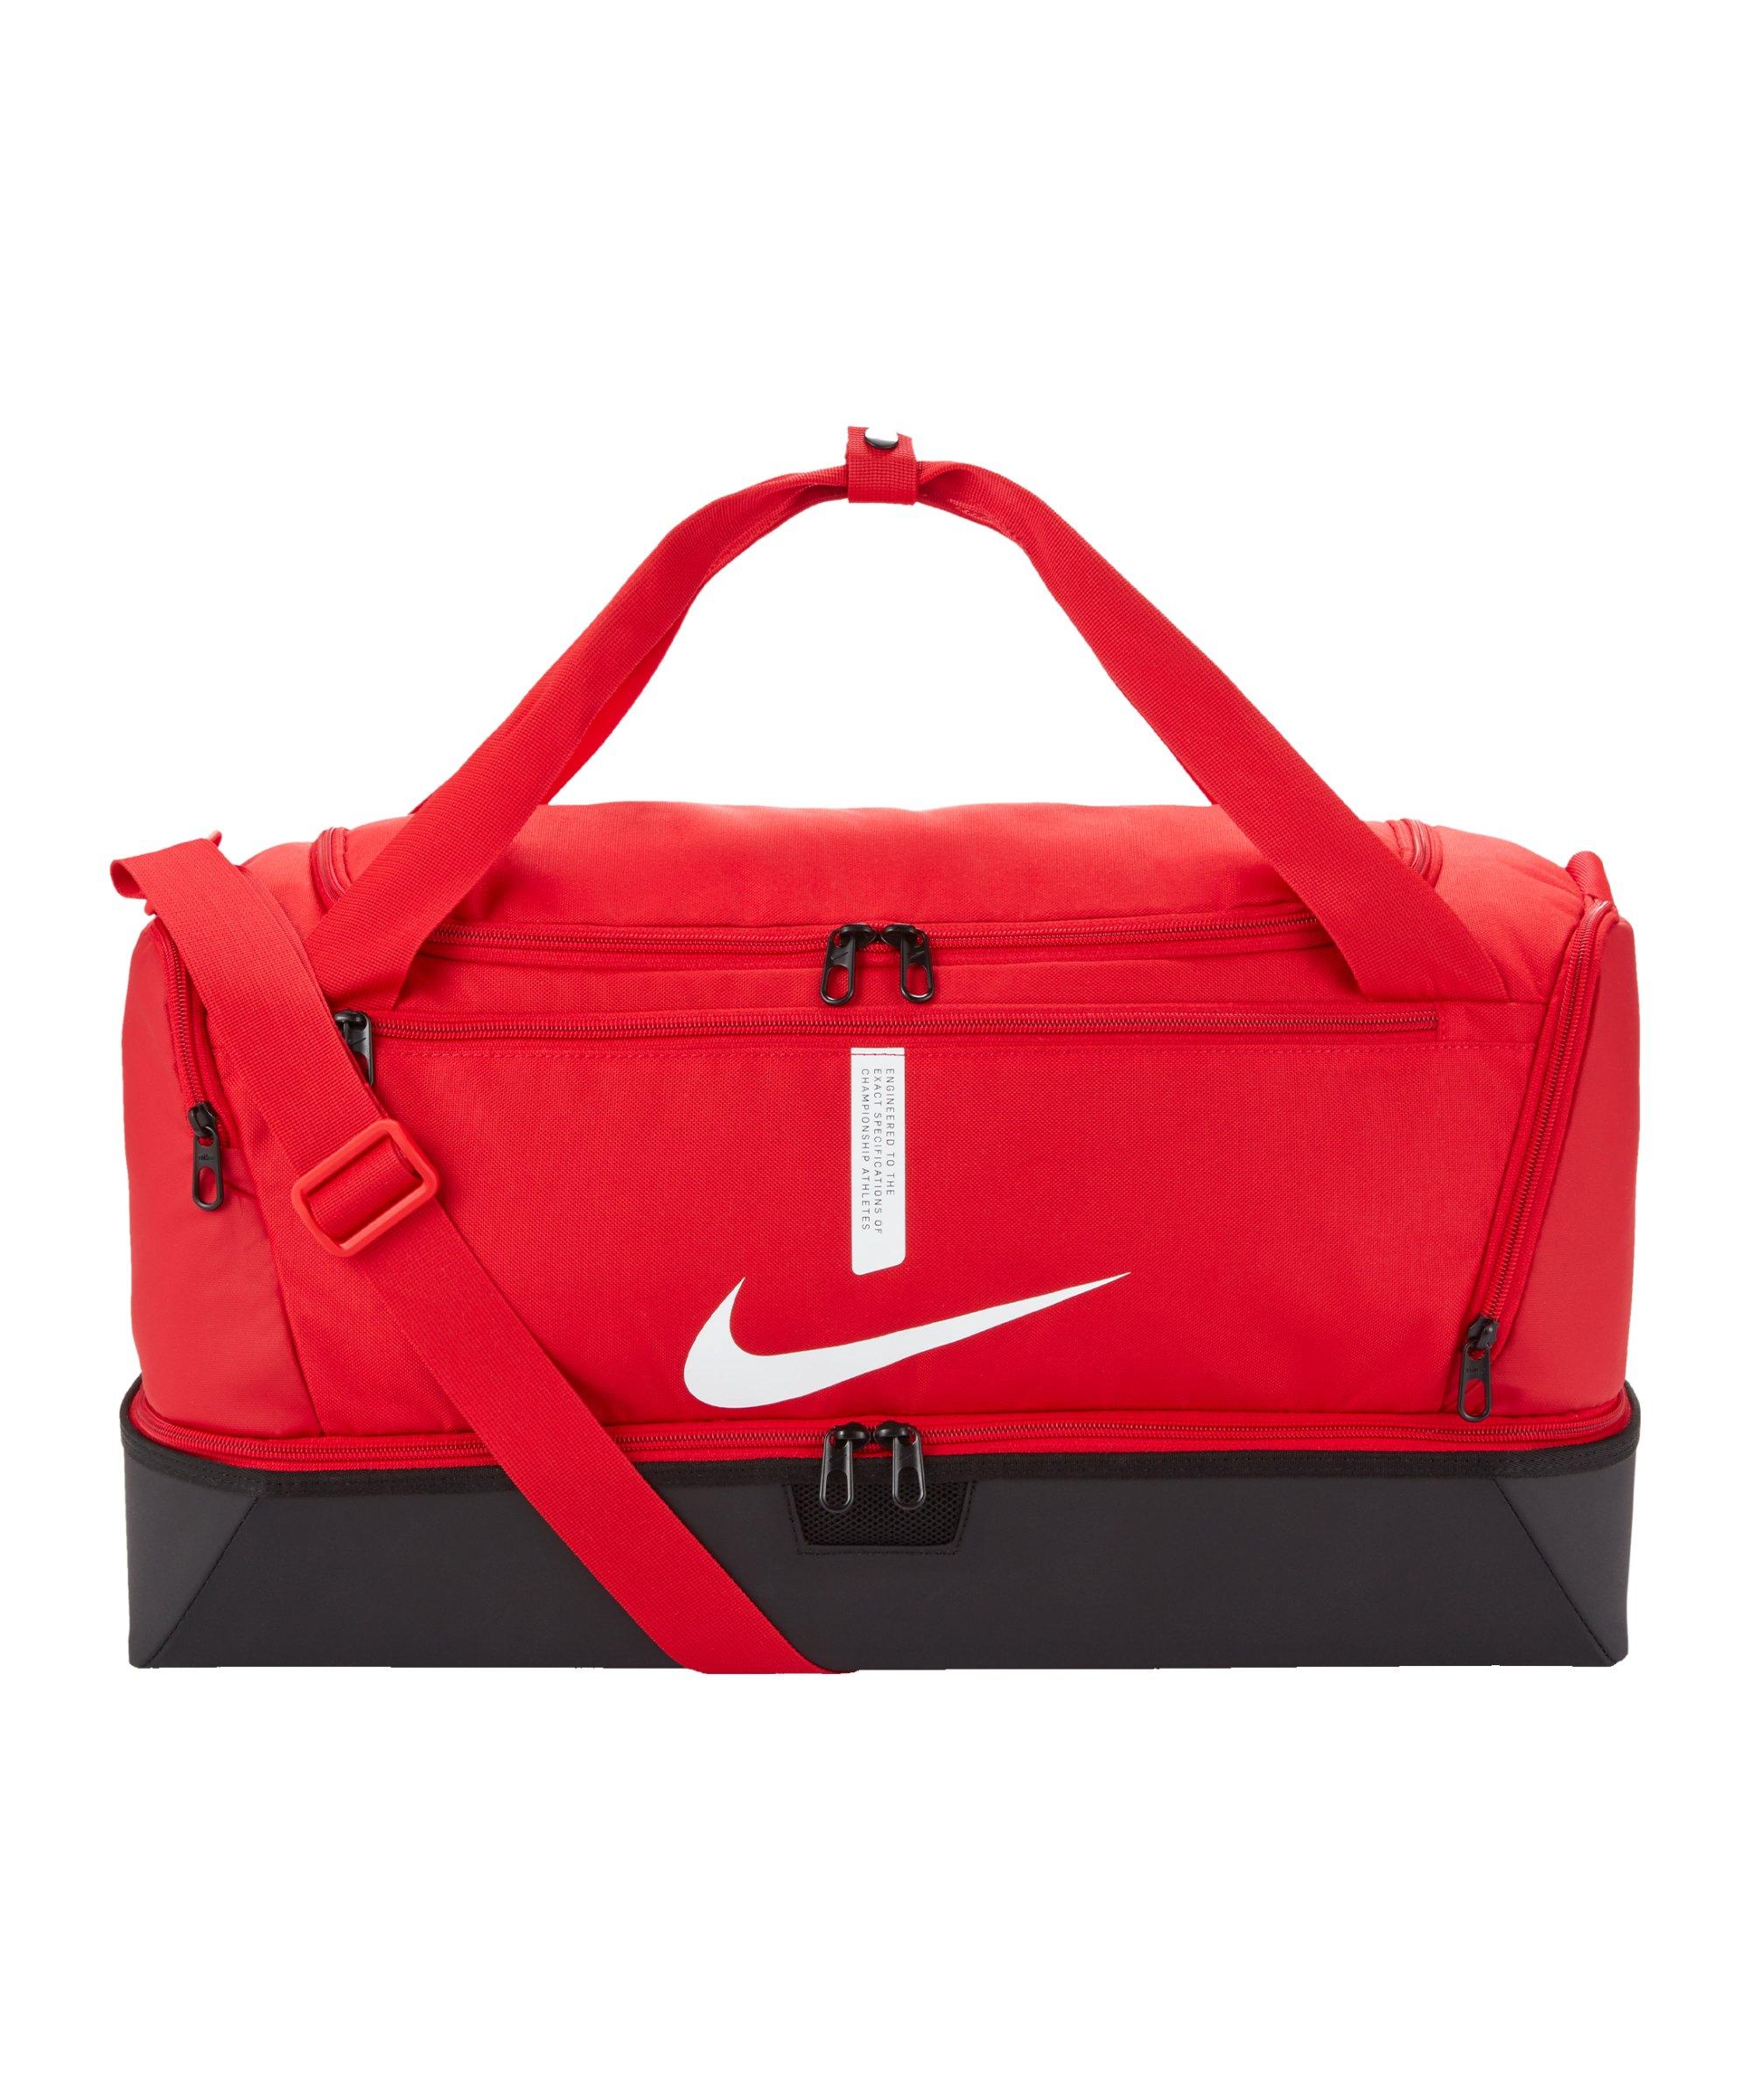 Nike Academy Team Hardcase Tasche Medium Rot F657 - rot